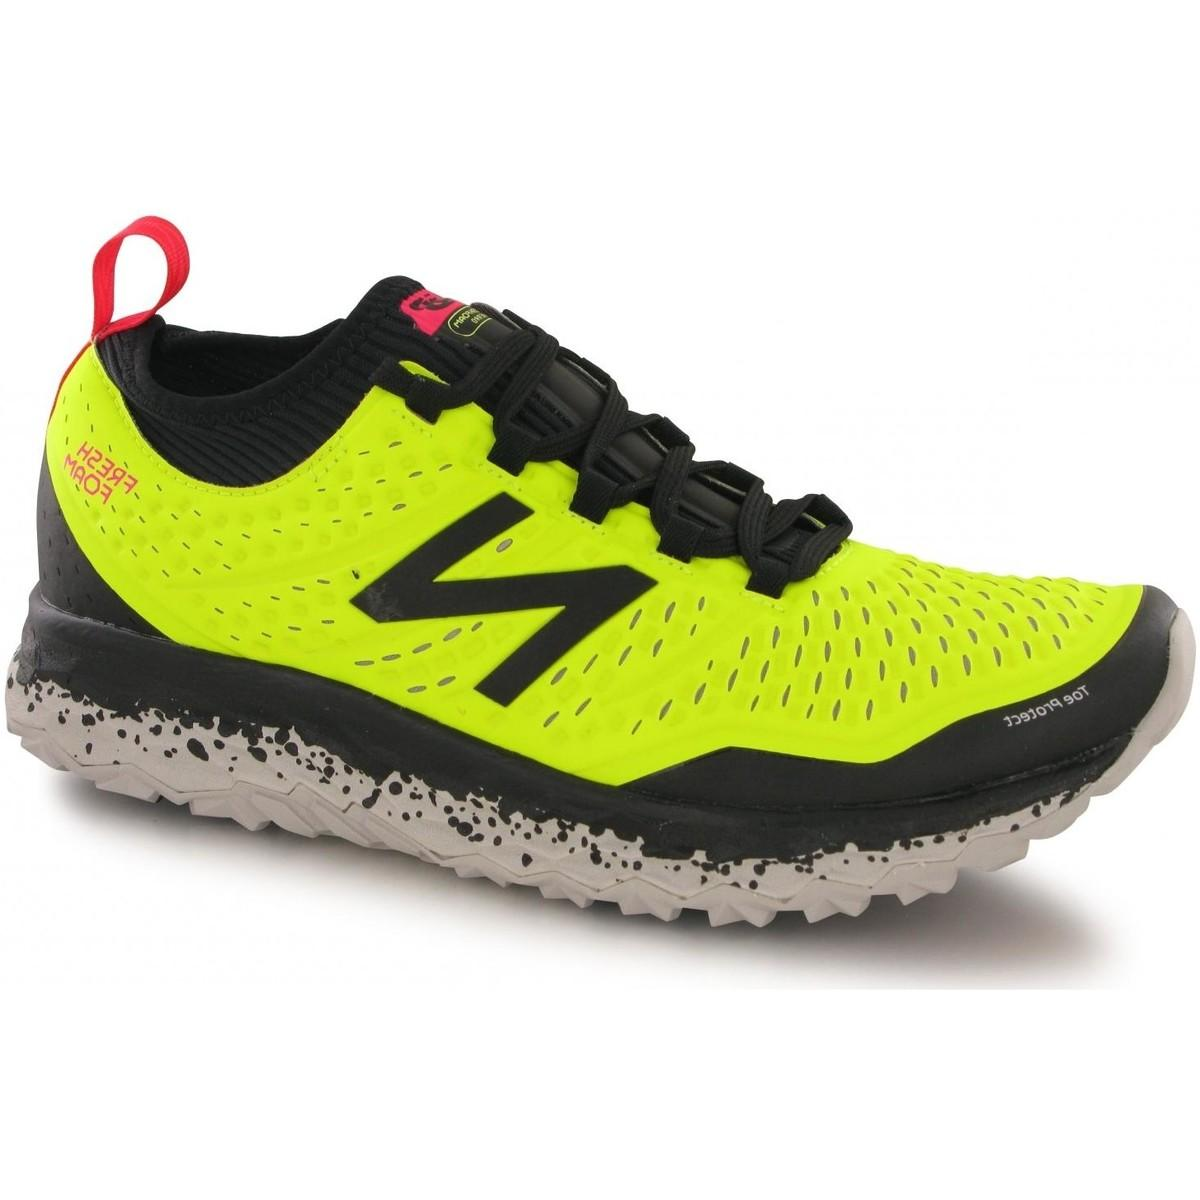 chaussures new balance spartoo spartoo,crampons mercurial